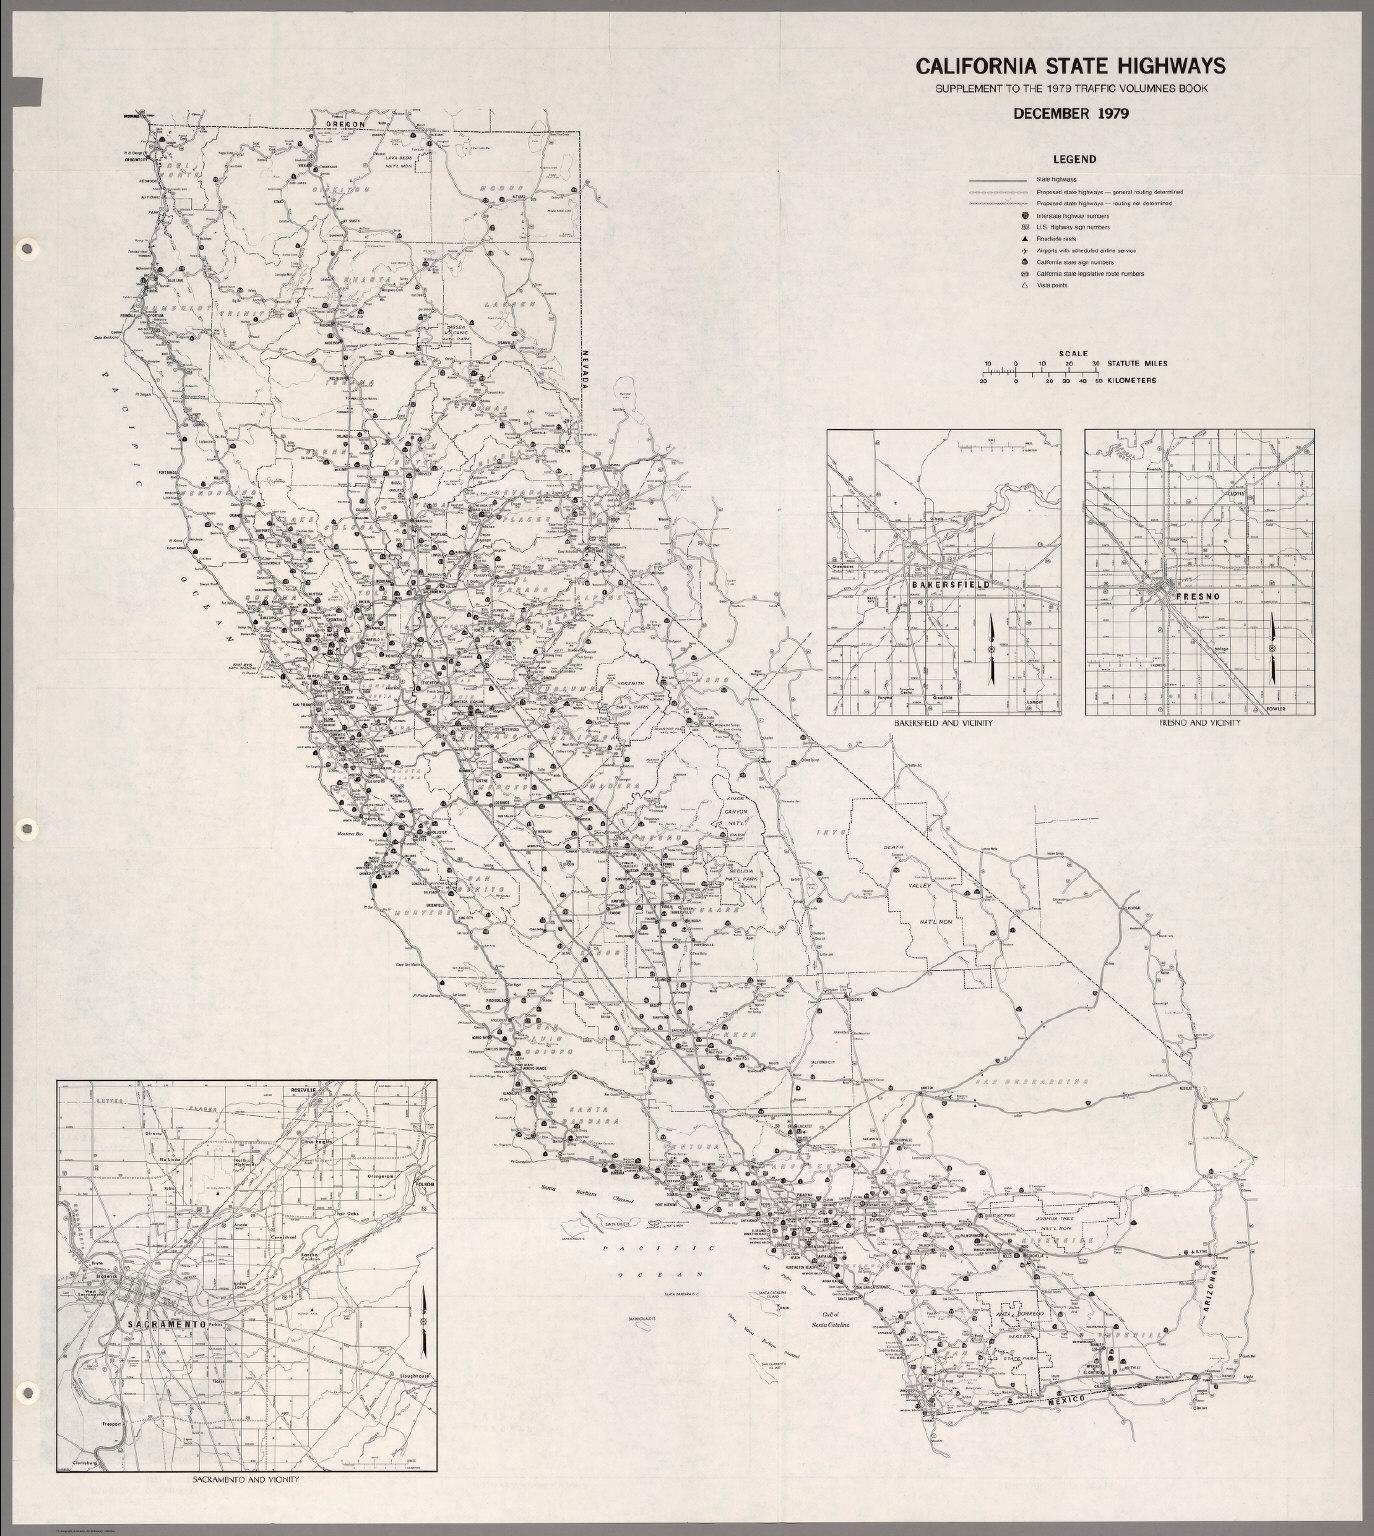 California State Highways, December 1979.